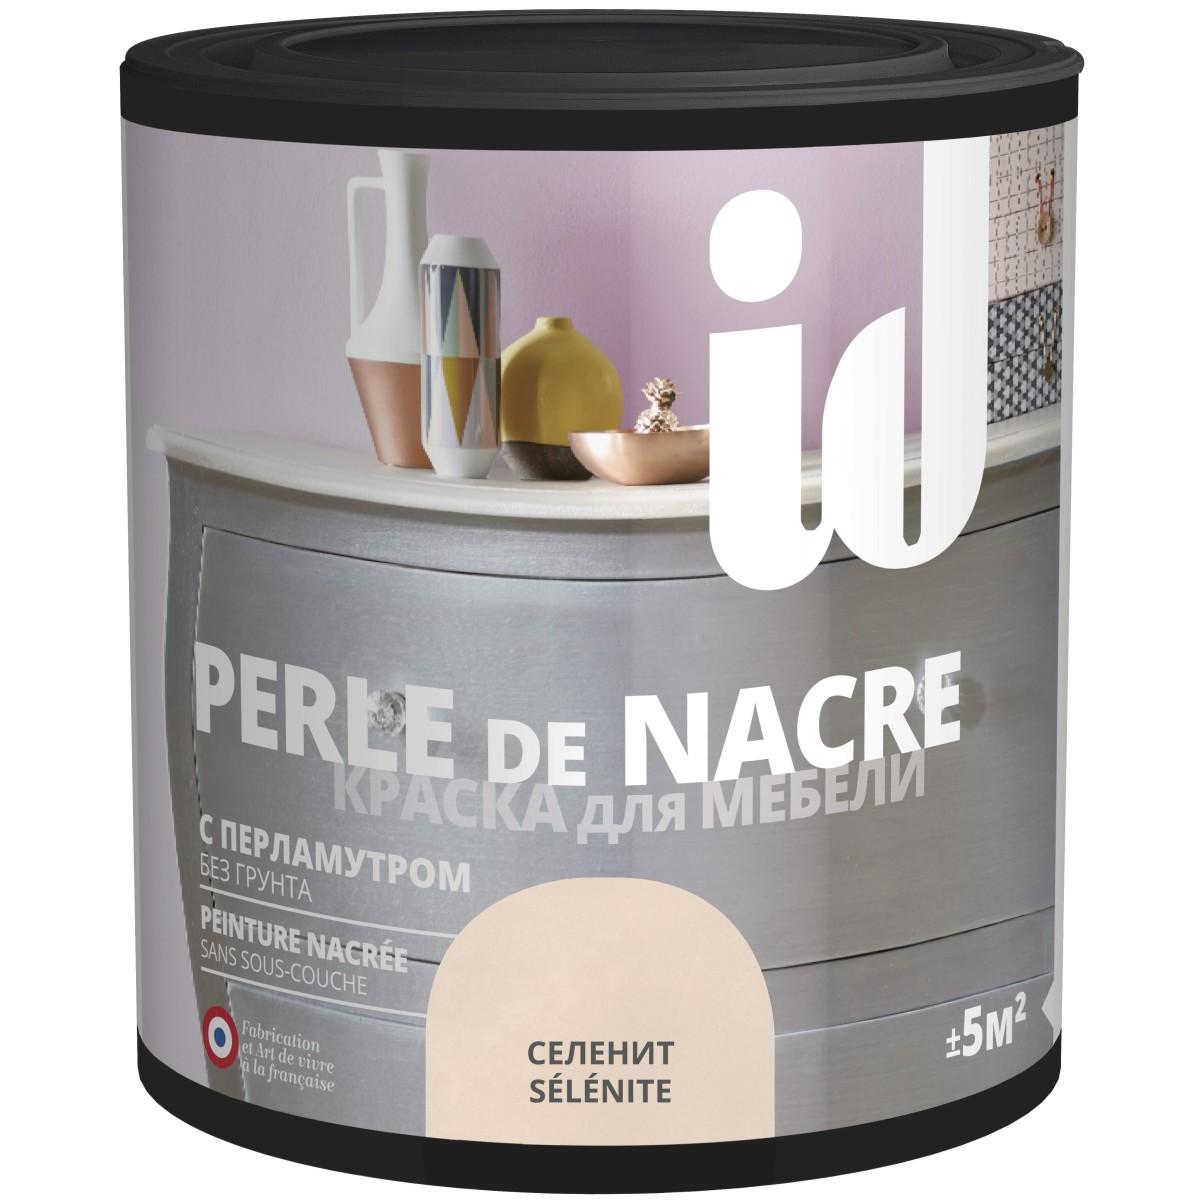 Краска для мебели ID Perle цвет селенит 0.5 л